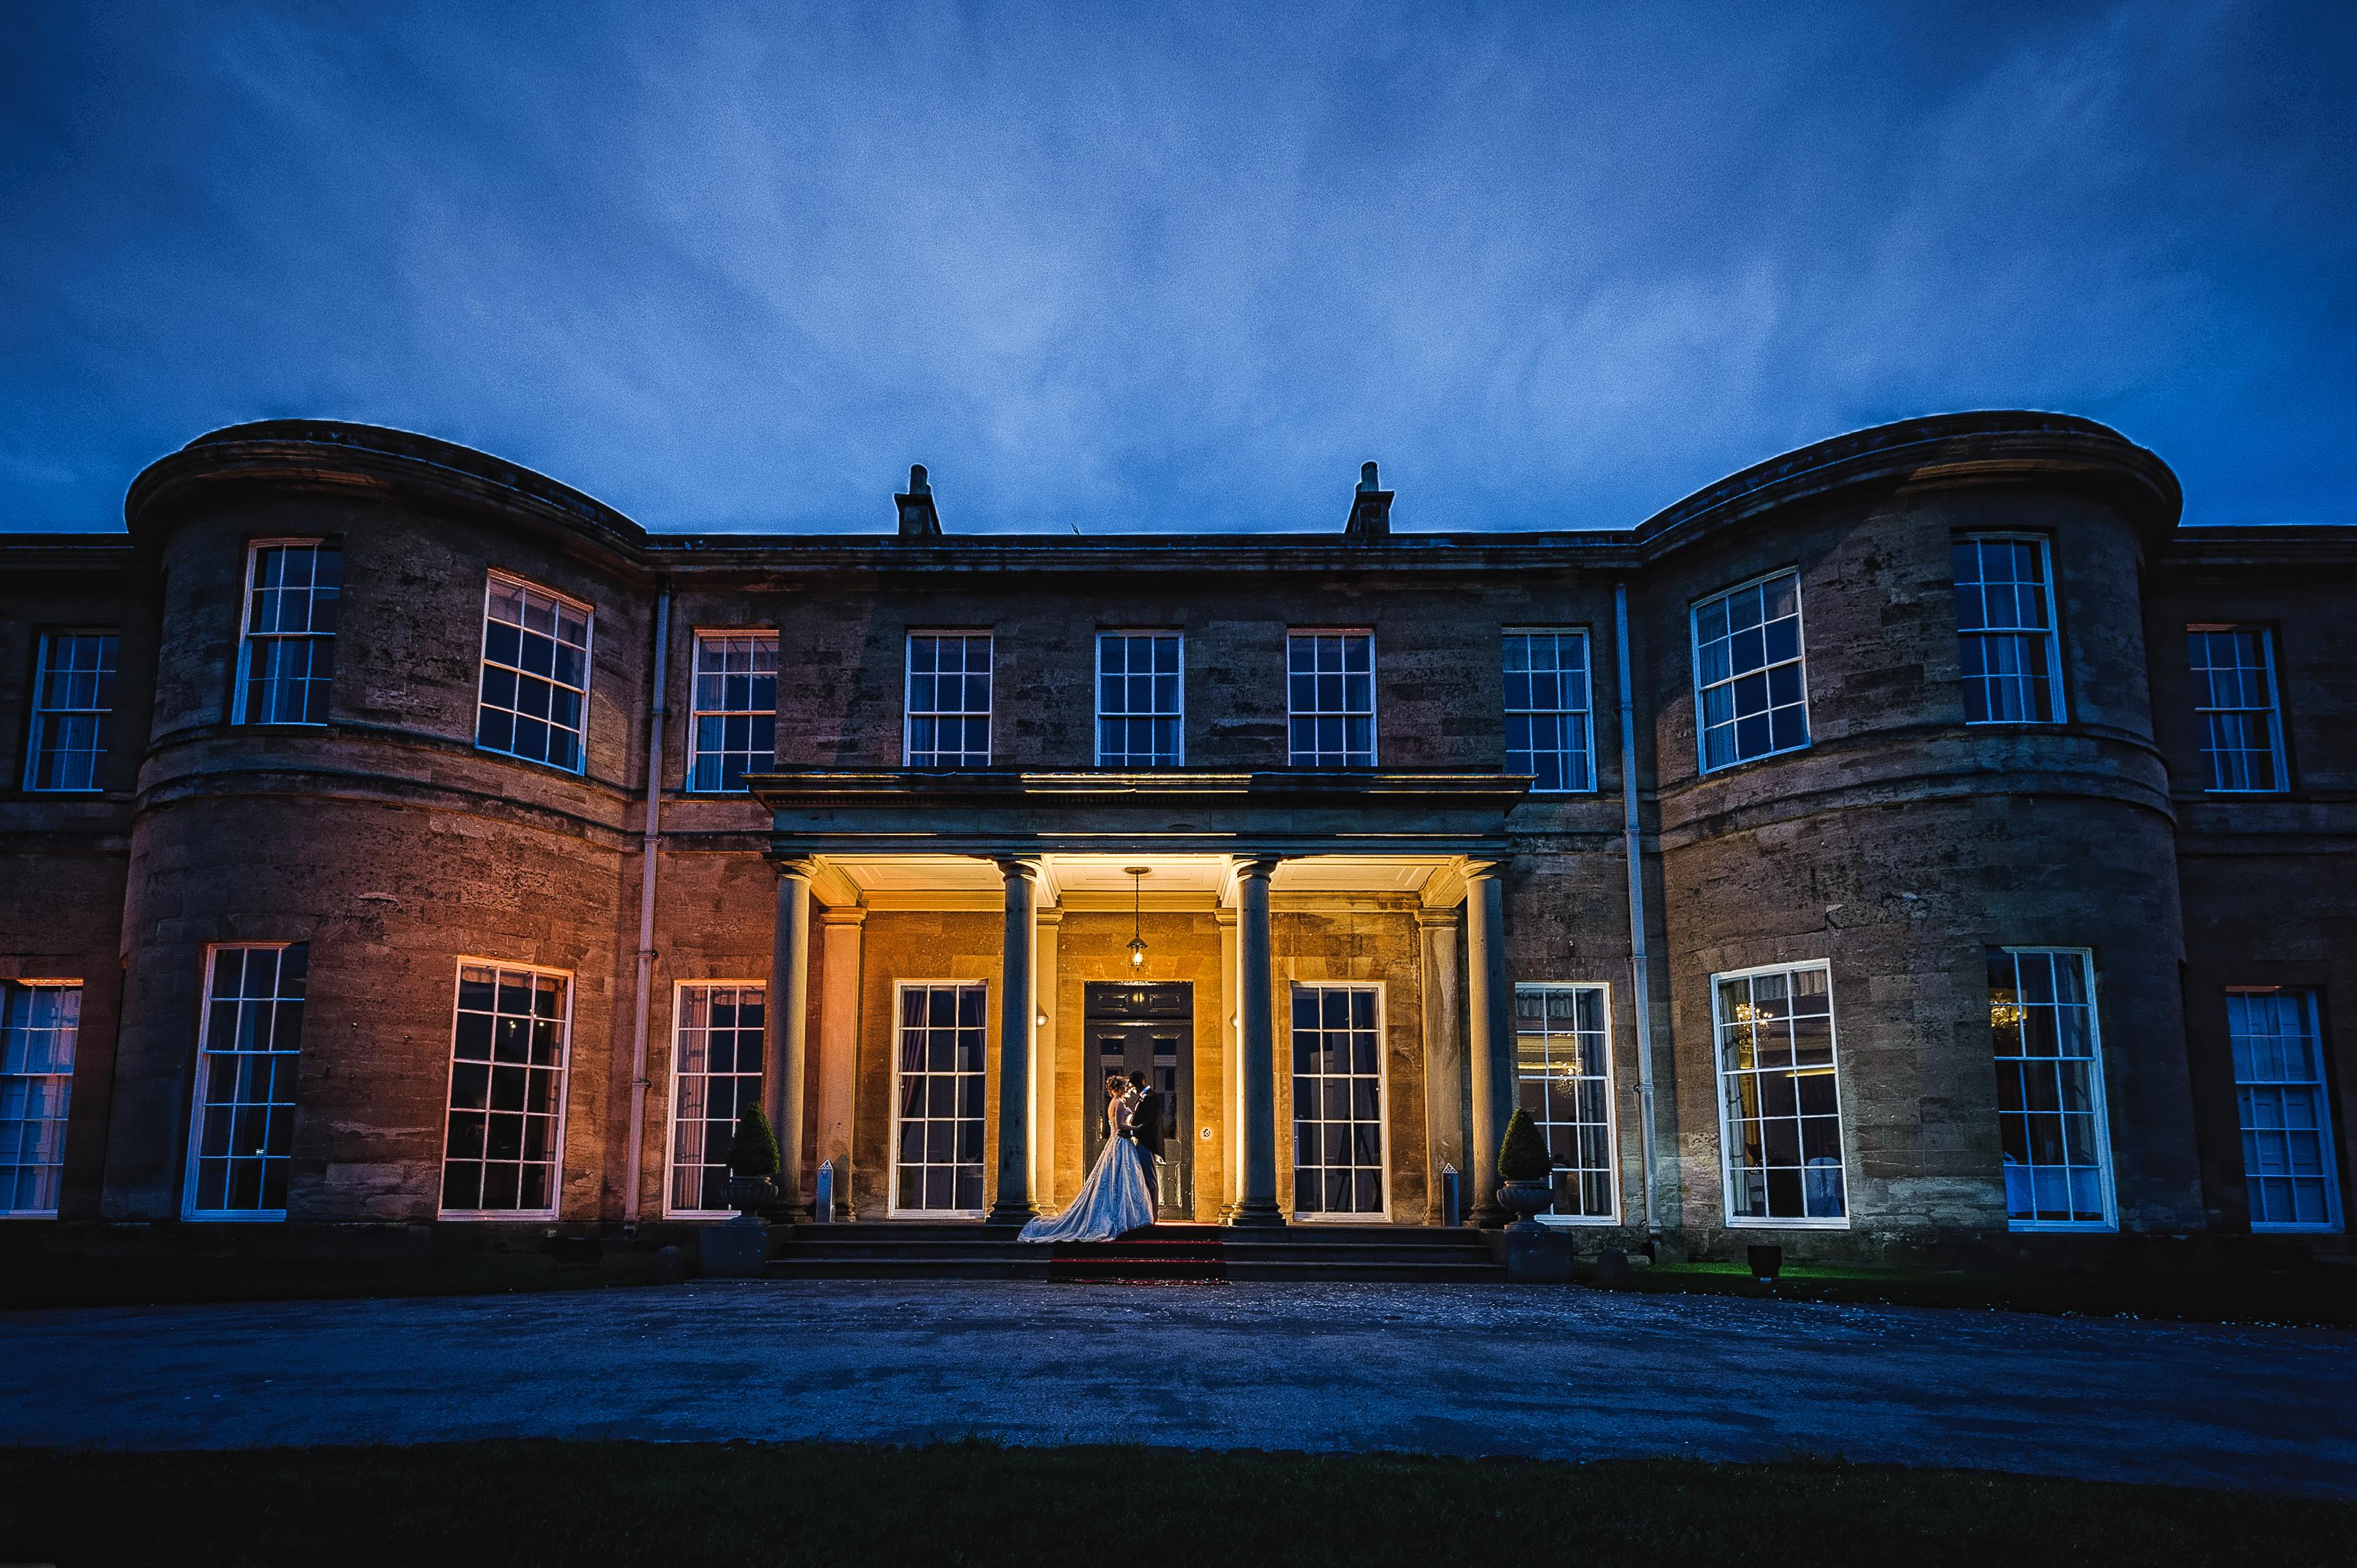 rudding park hotel wedding photography at night